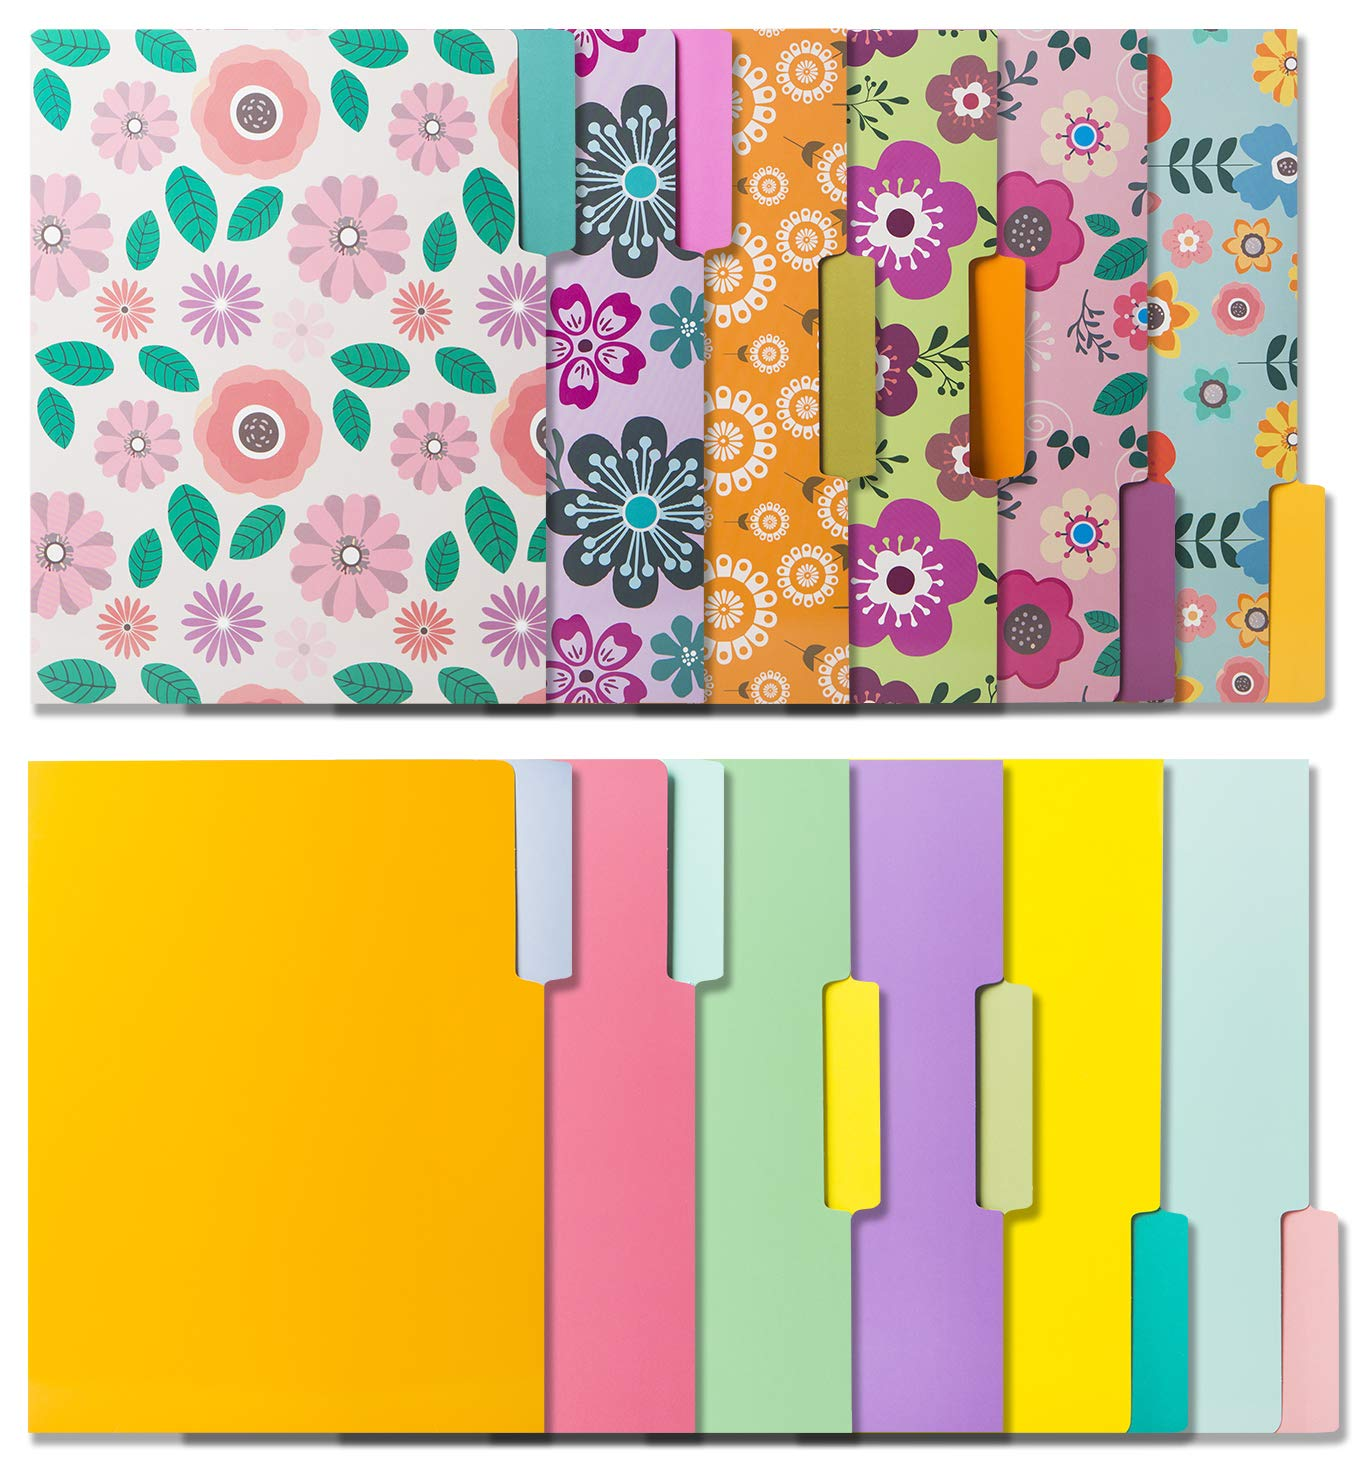 Colored File Folders -12 File Folders In Vibrant Colors & Cute Floral Designs -Decorative File Folders -Cute File Folders- Pretty File Folders- Letter Size File Folders -9.5 x 11.5 Inches (Pack of 12)